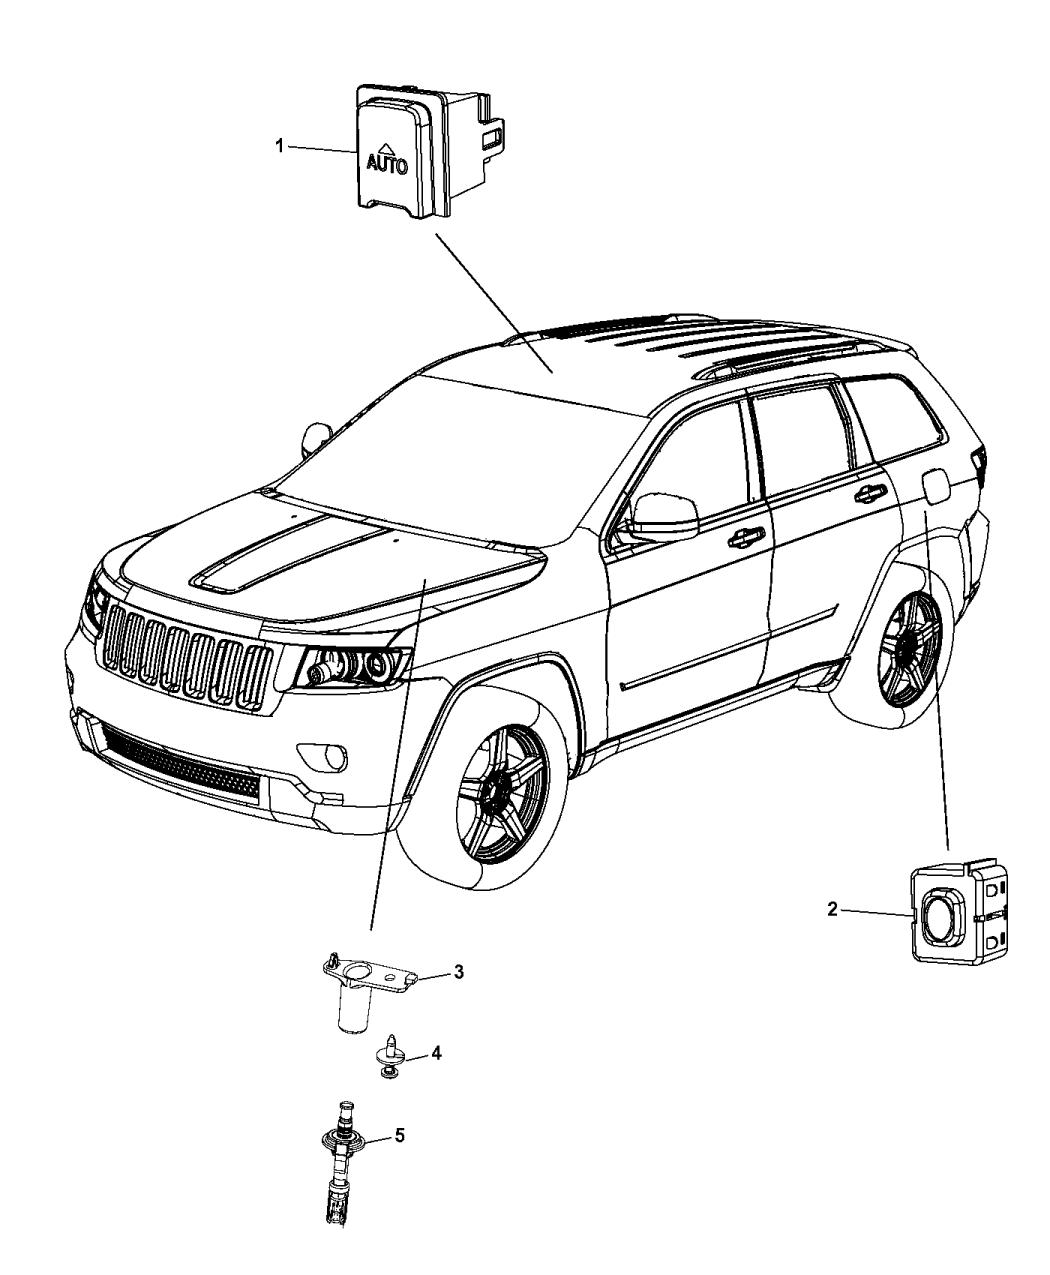 68251802aa genuine mopar plate striker 2006 jeep liberty engine diagram